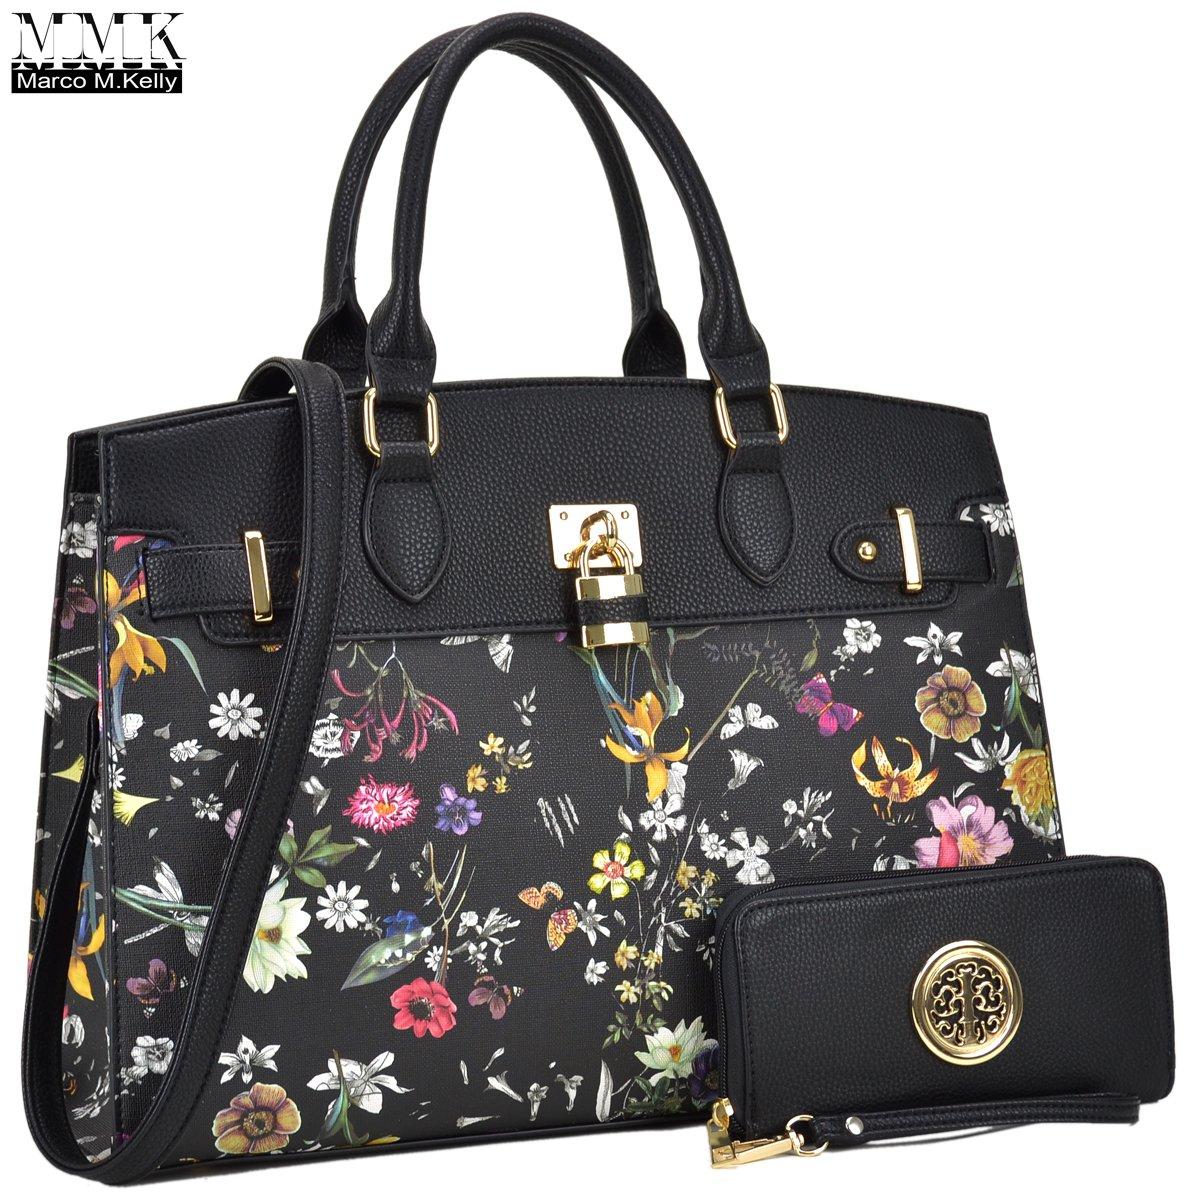 MMK collection Fashion Women Purses and Handbags Ladies Designer Satchel Handbag Tote Bag Shoulder Bags with coin purse (Z-6876-BLF)